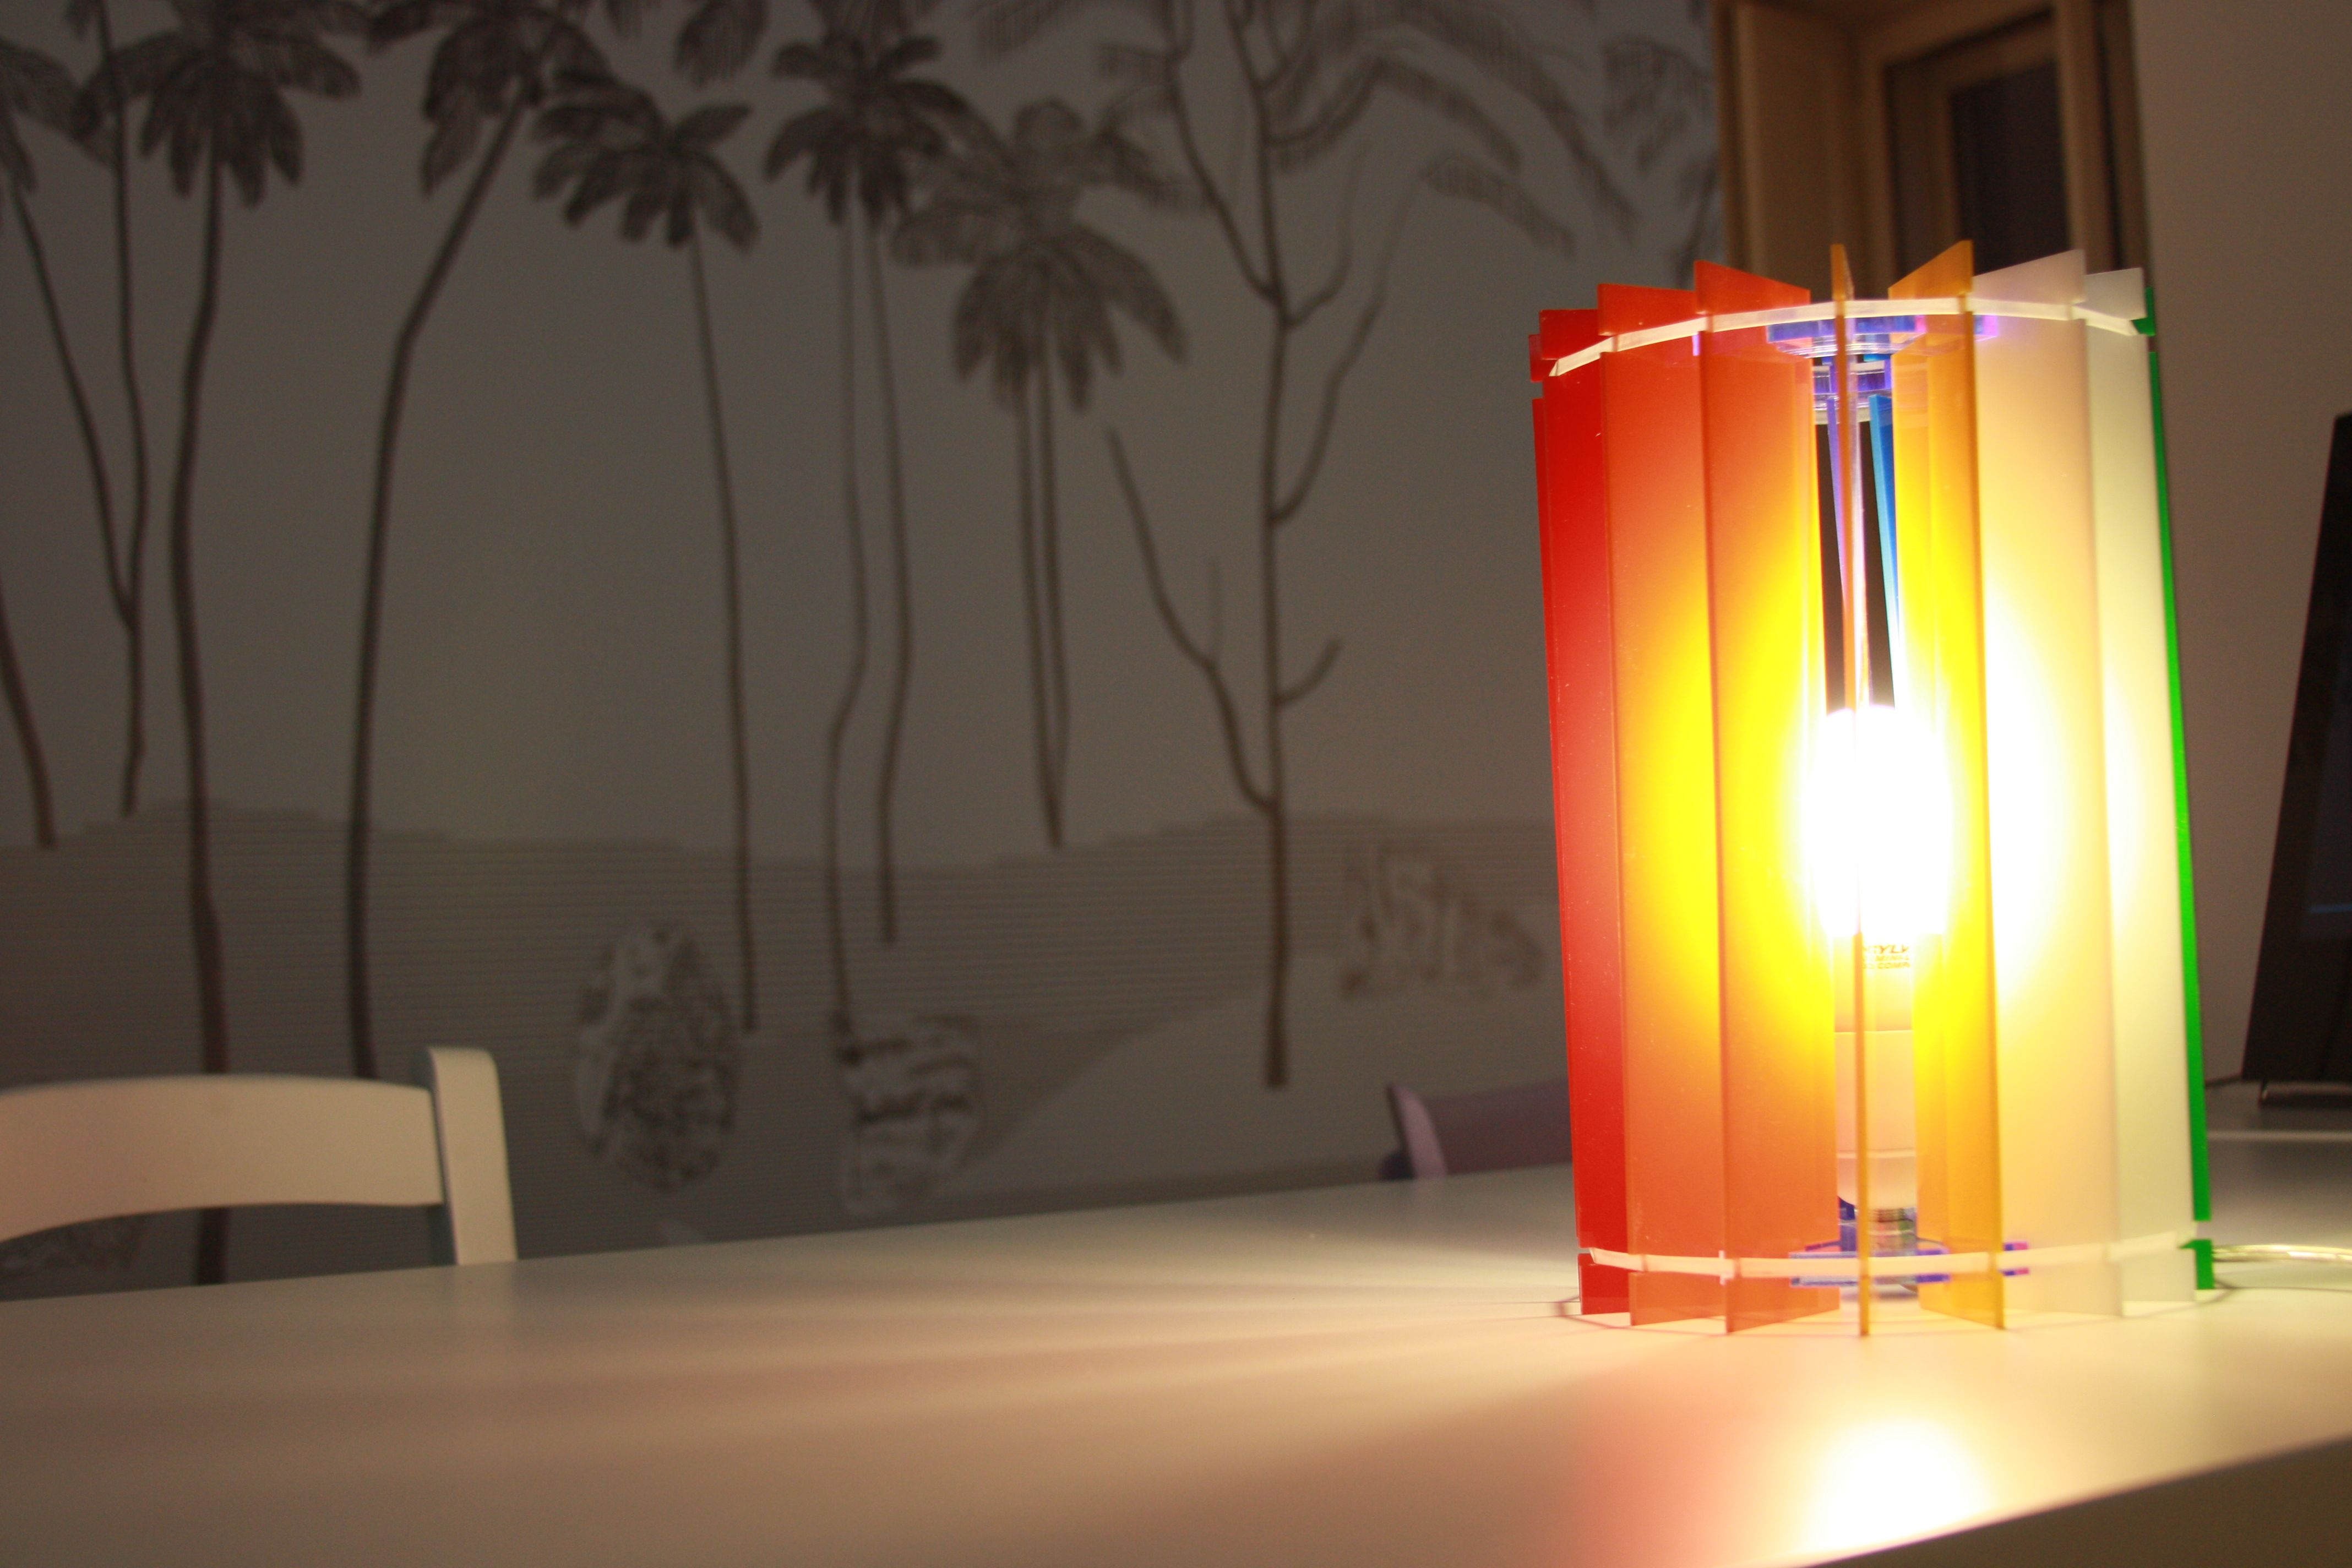 Webmobili Illuminazione ~ Lampada turbina. #design #light #lamp #designtrasparente